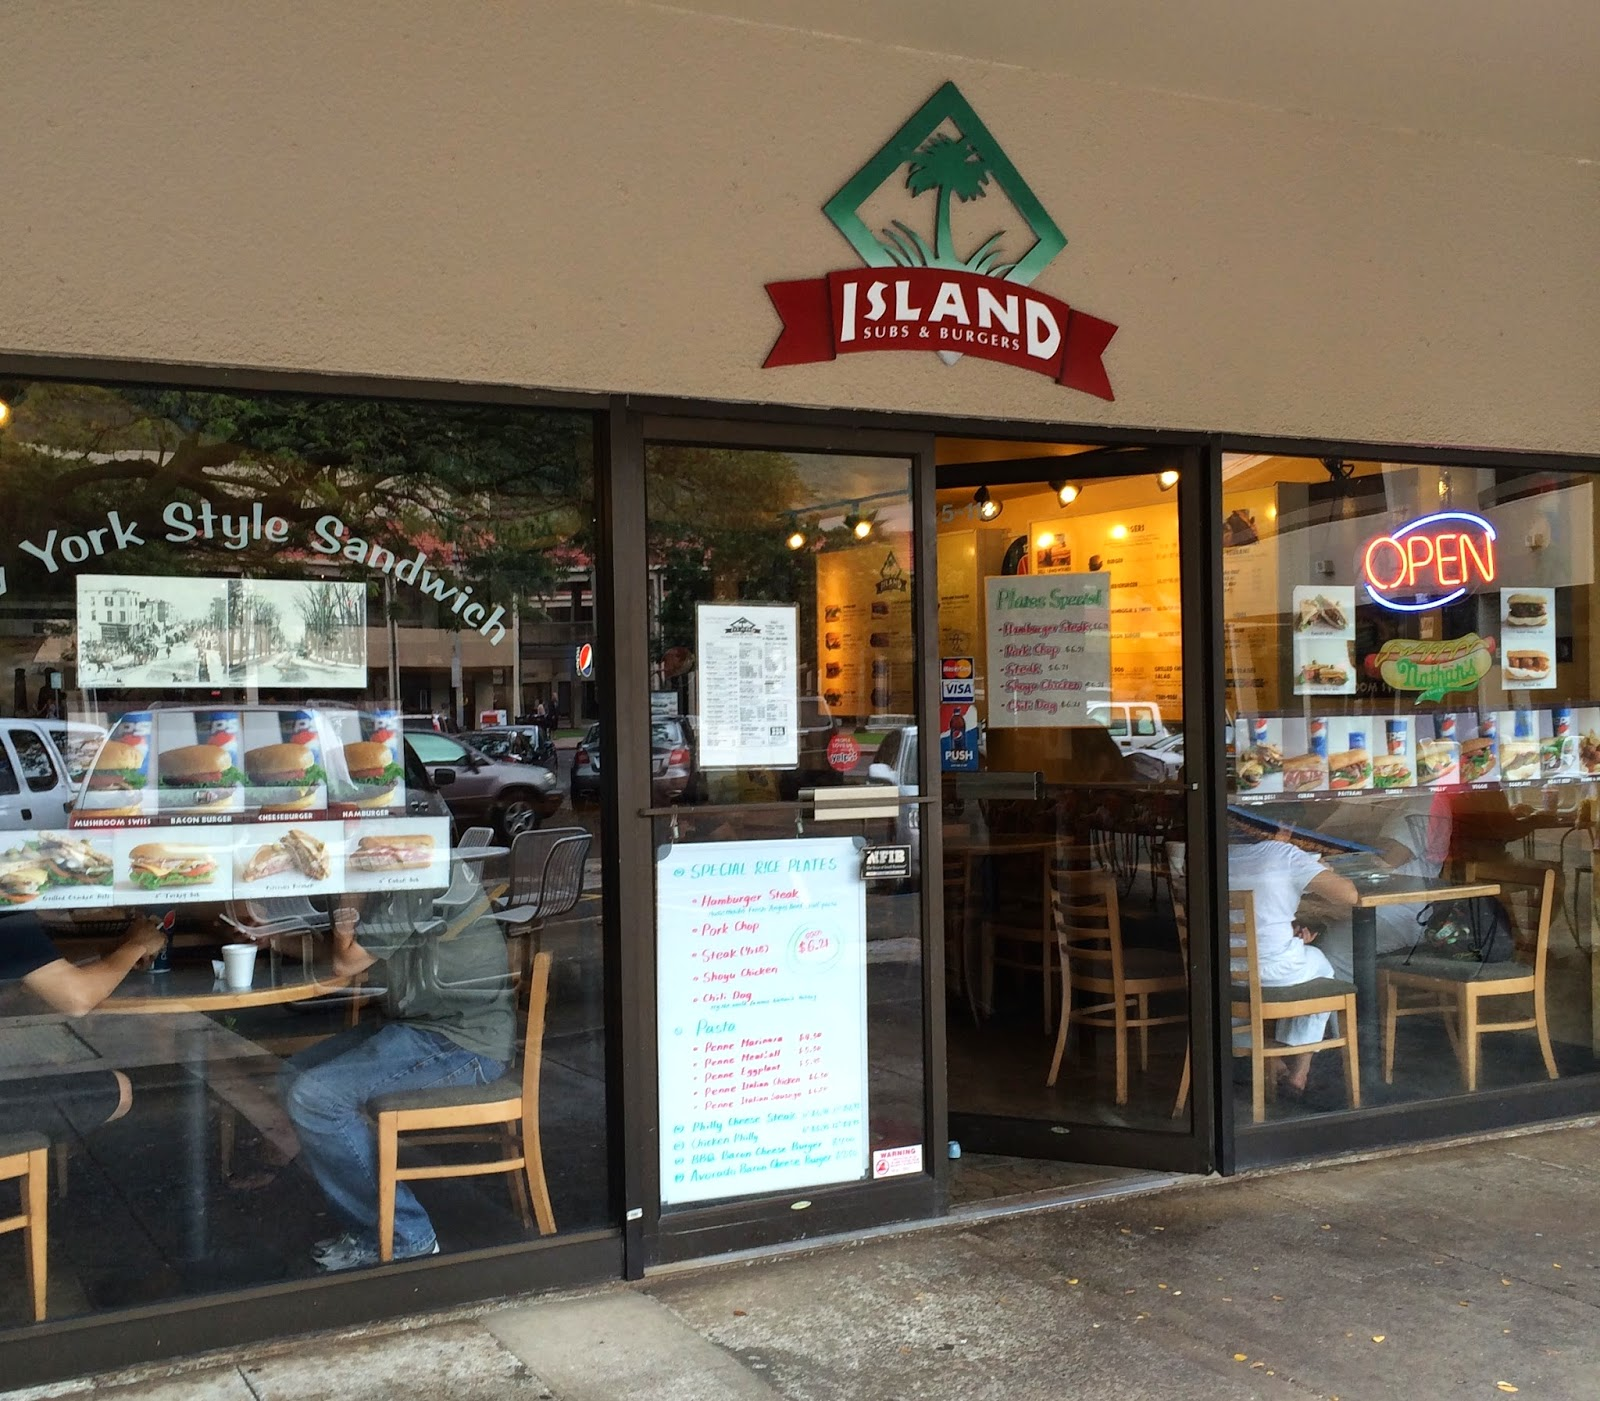 Island Sub And Burgers In Manoa Marketplace